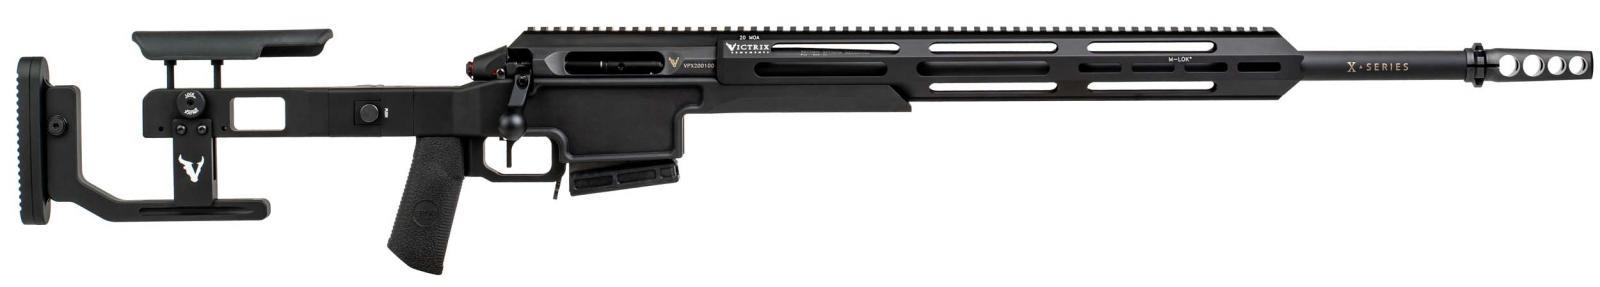 Carabine VICTRIX Gladio X SERIES